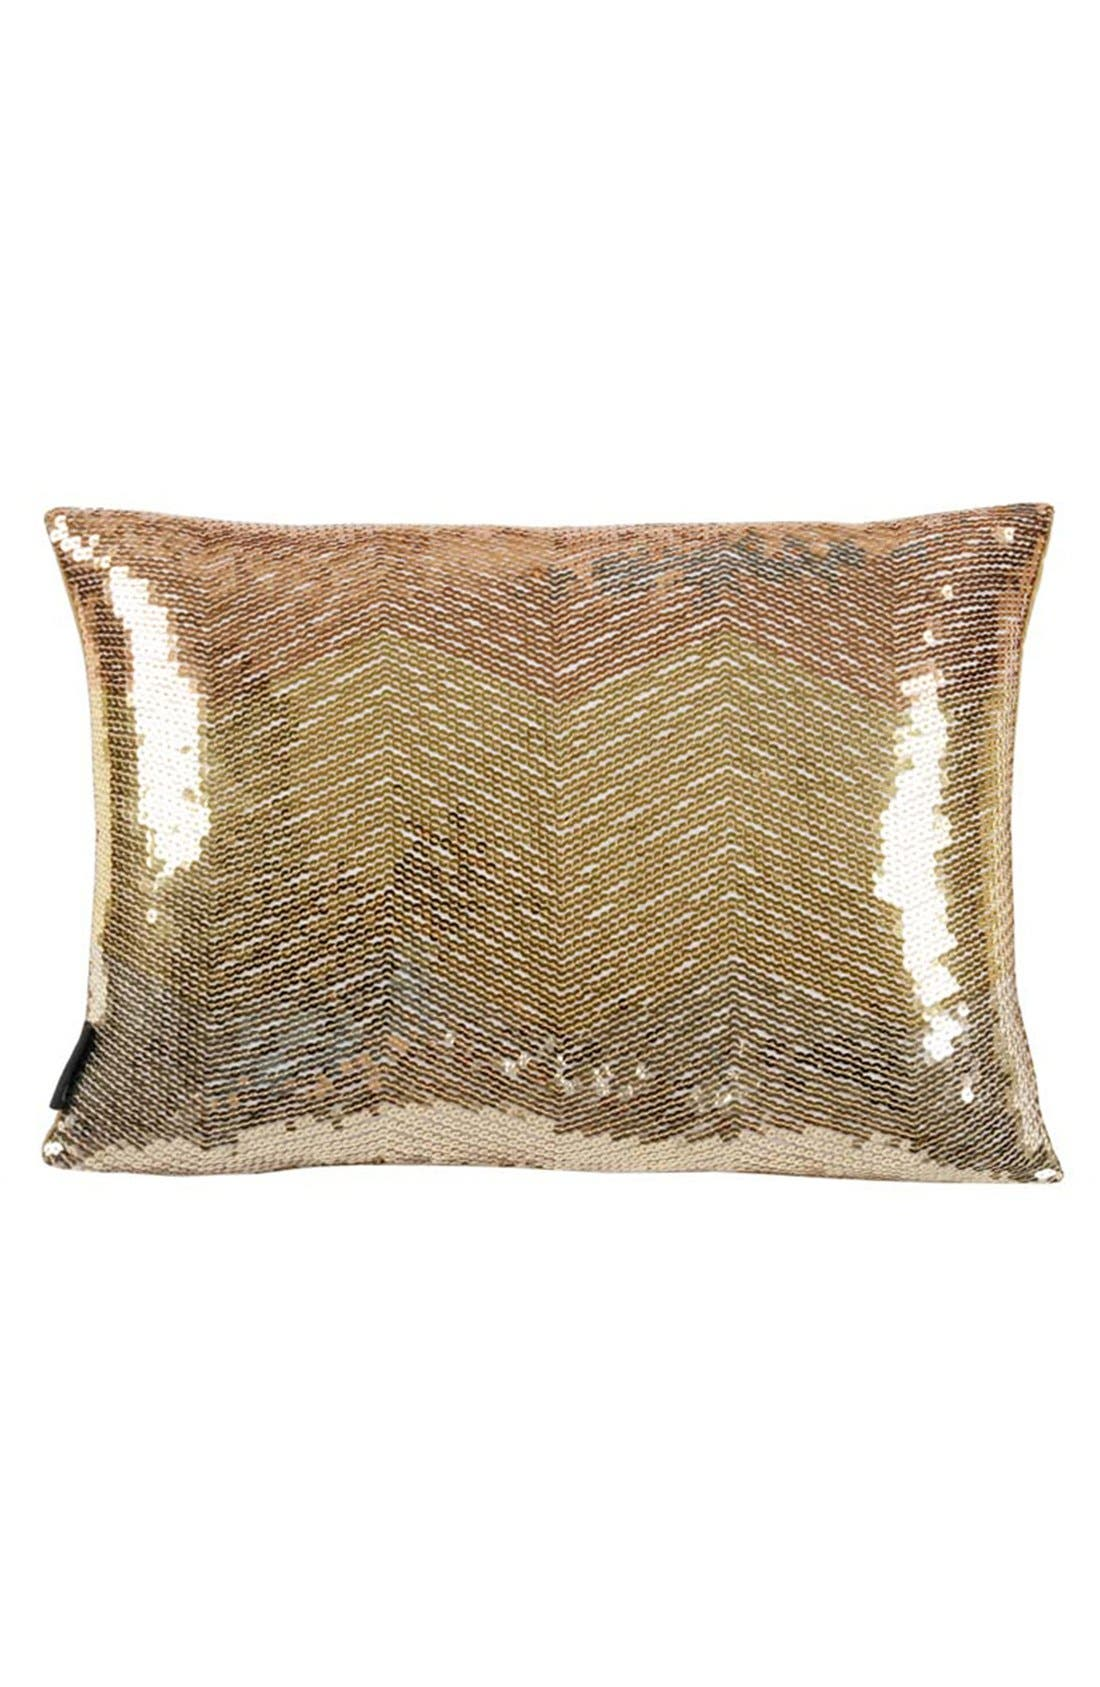 Alternate Image 1 Selected - Blissliving Home 'Sasha' Sequin Pillow